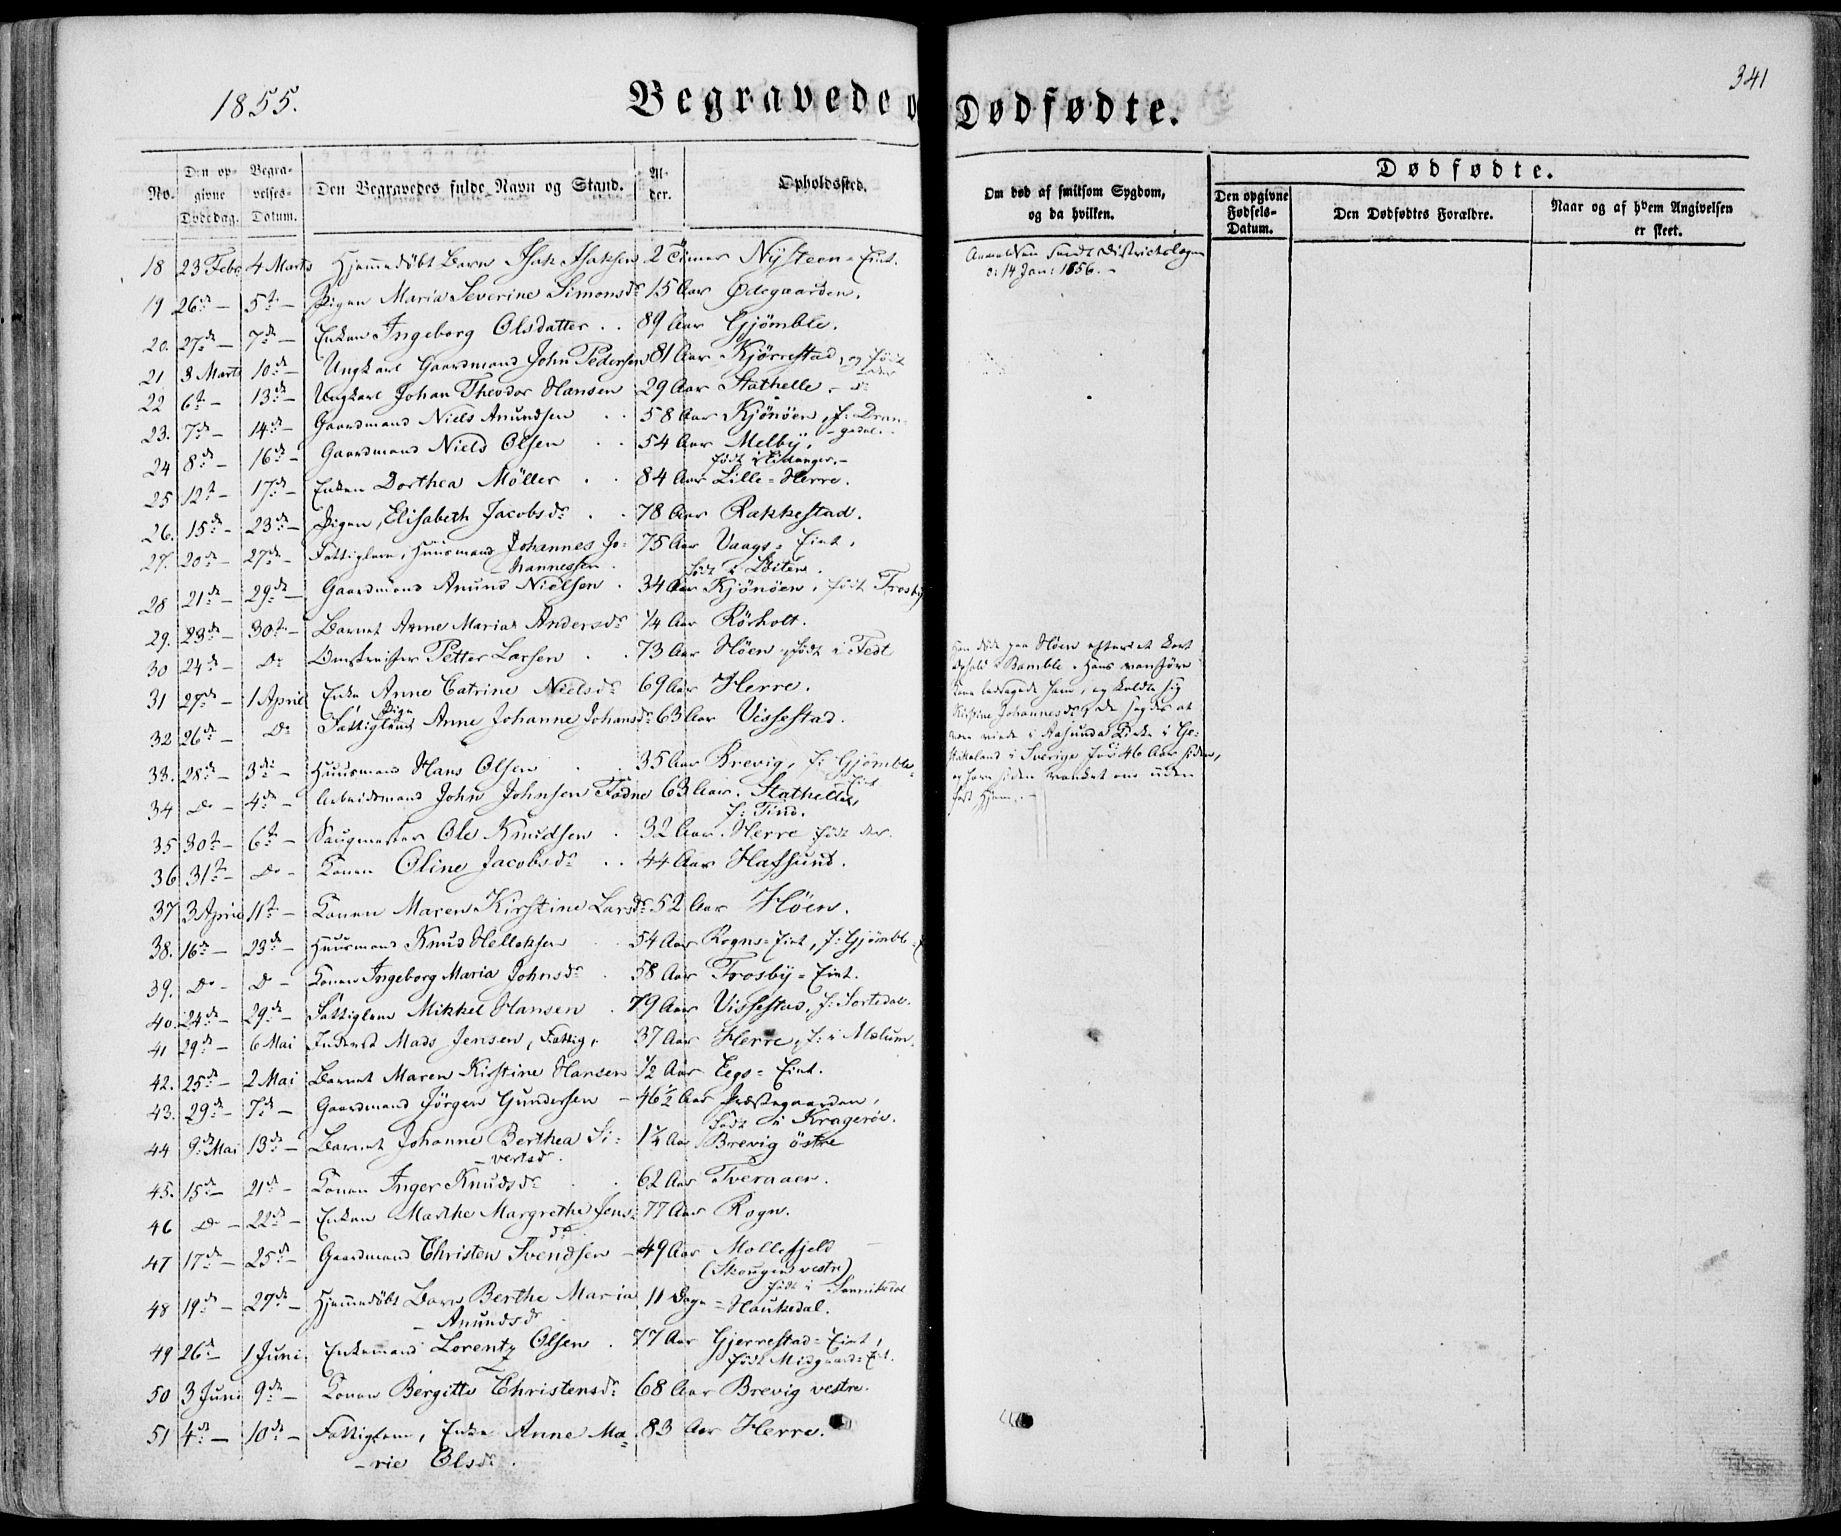 SAKO, Bamble kirkebøker, F/Fa/L0005: Ministerialbok nr. I 5, 1854-1869, s. 341